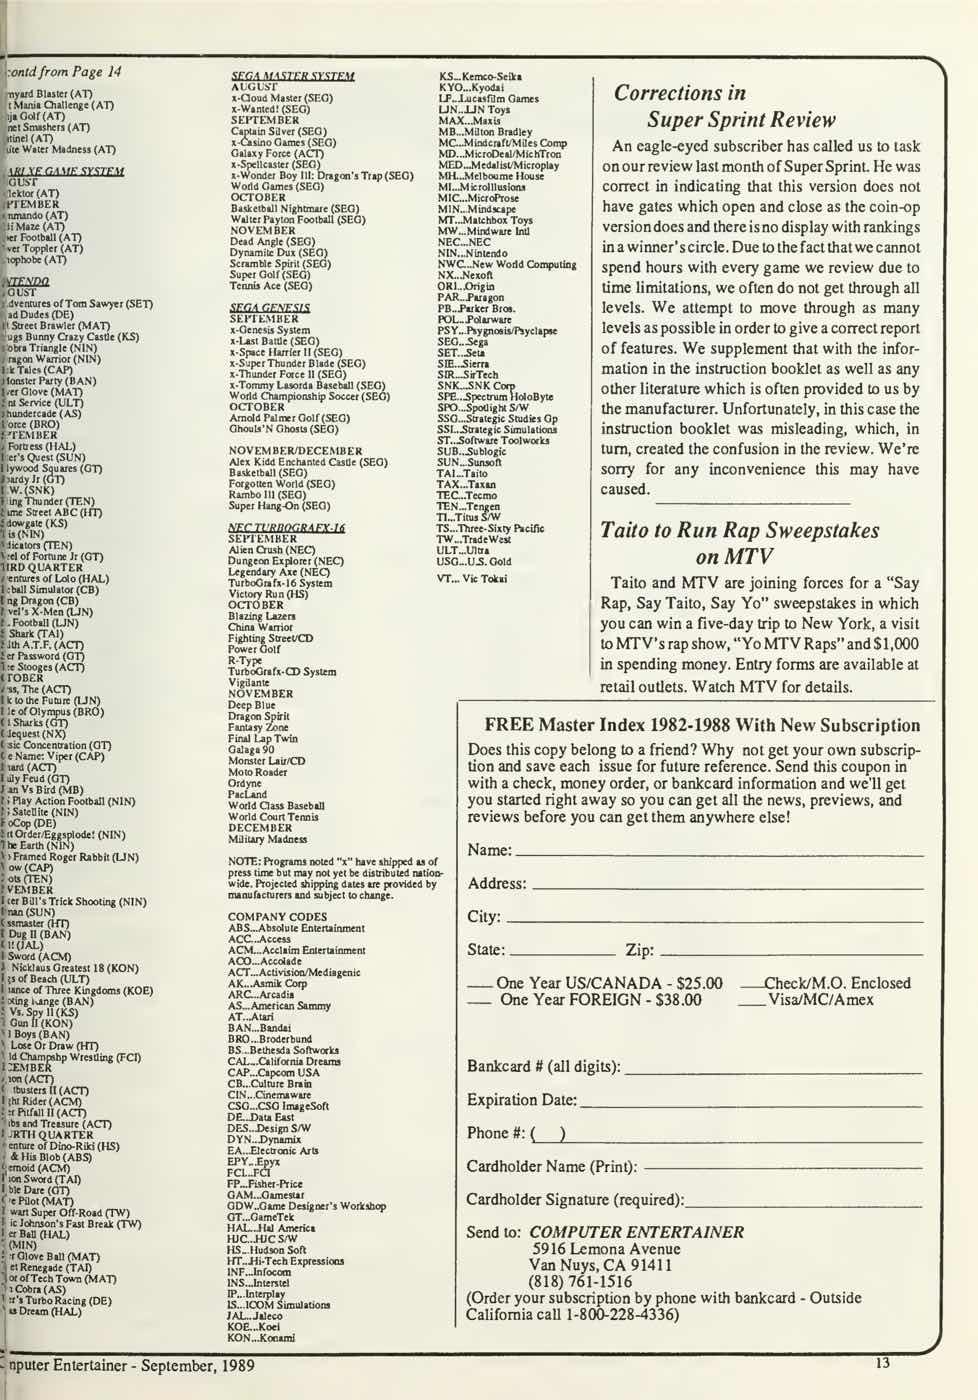 Computer Entertainer | September 1989 p13